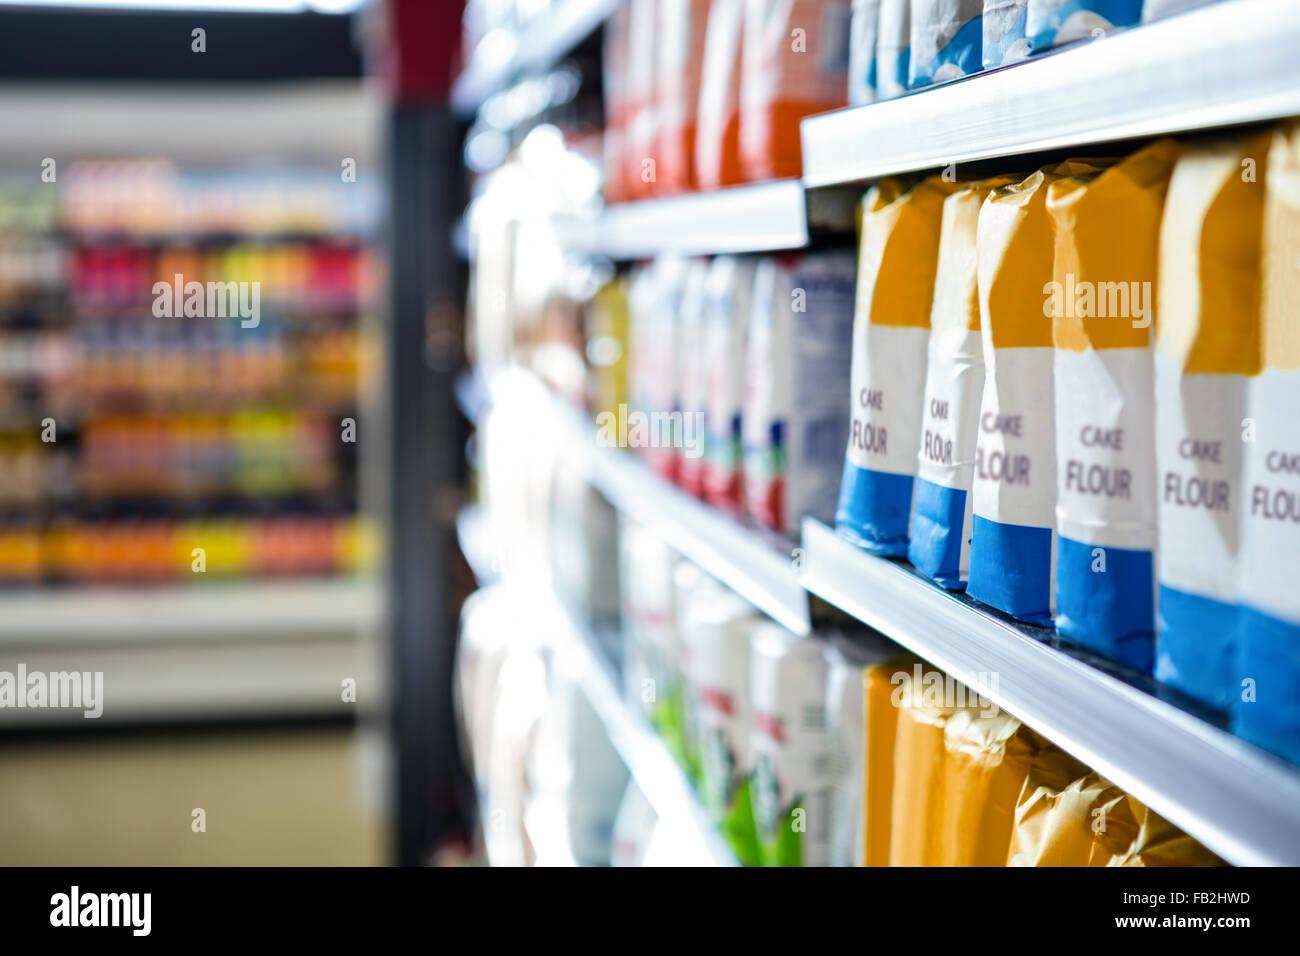 Supermarket shelves - Stock Image